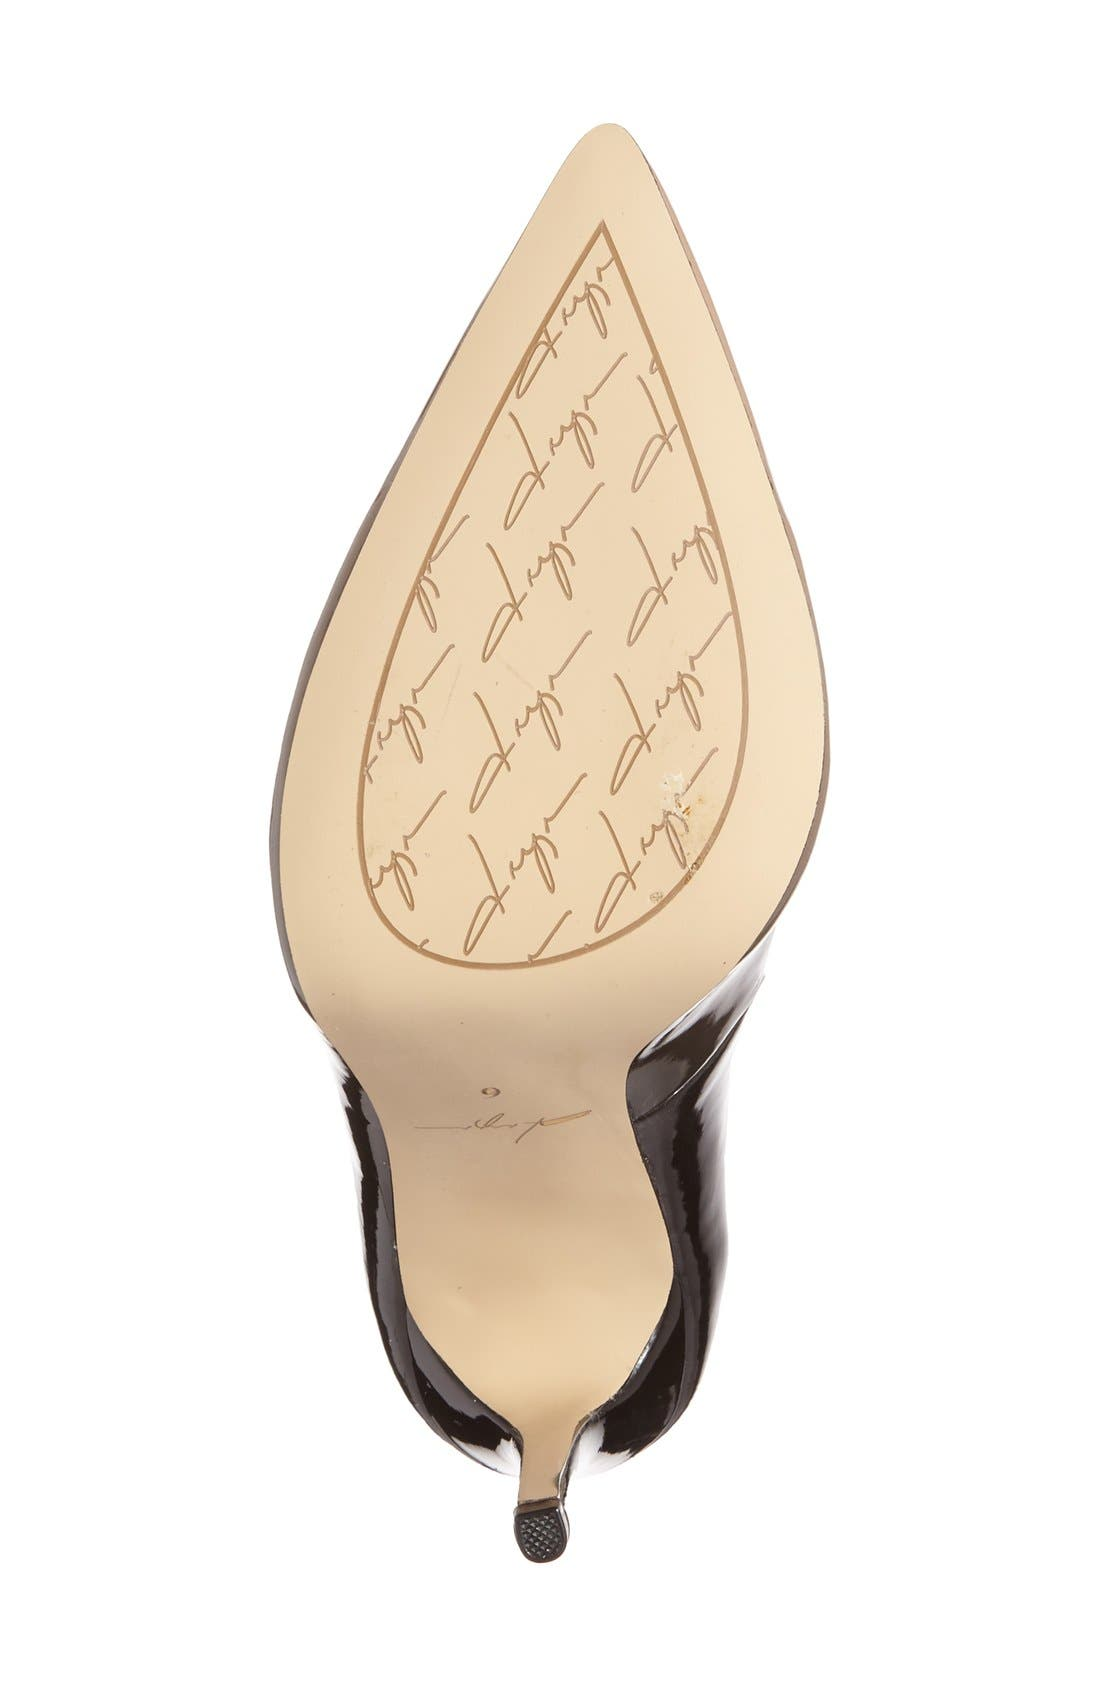 by Zendaya 'Atmore II' Pointy Toe Pump,                             Alternate thumbnail 4, color,                             Black/ Blush Patent